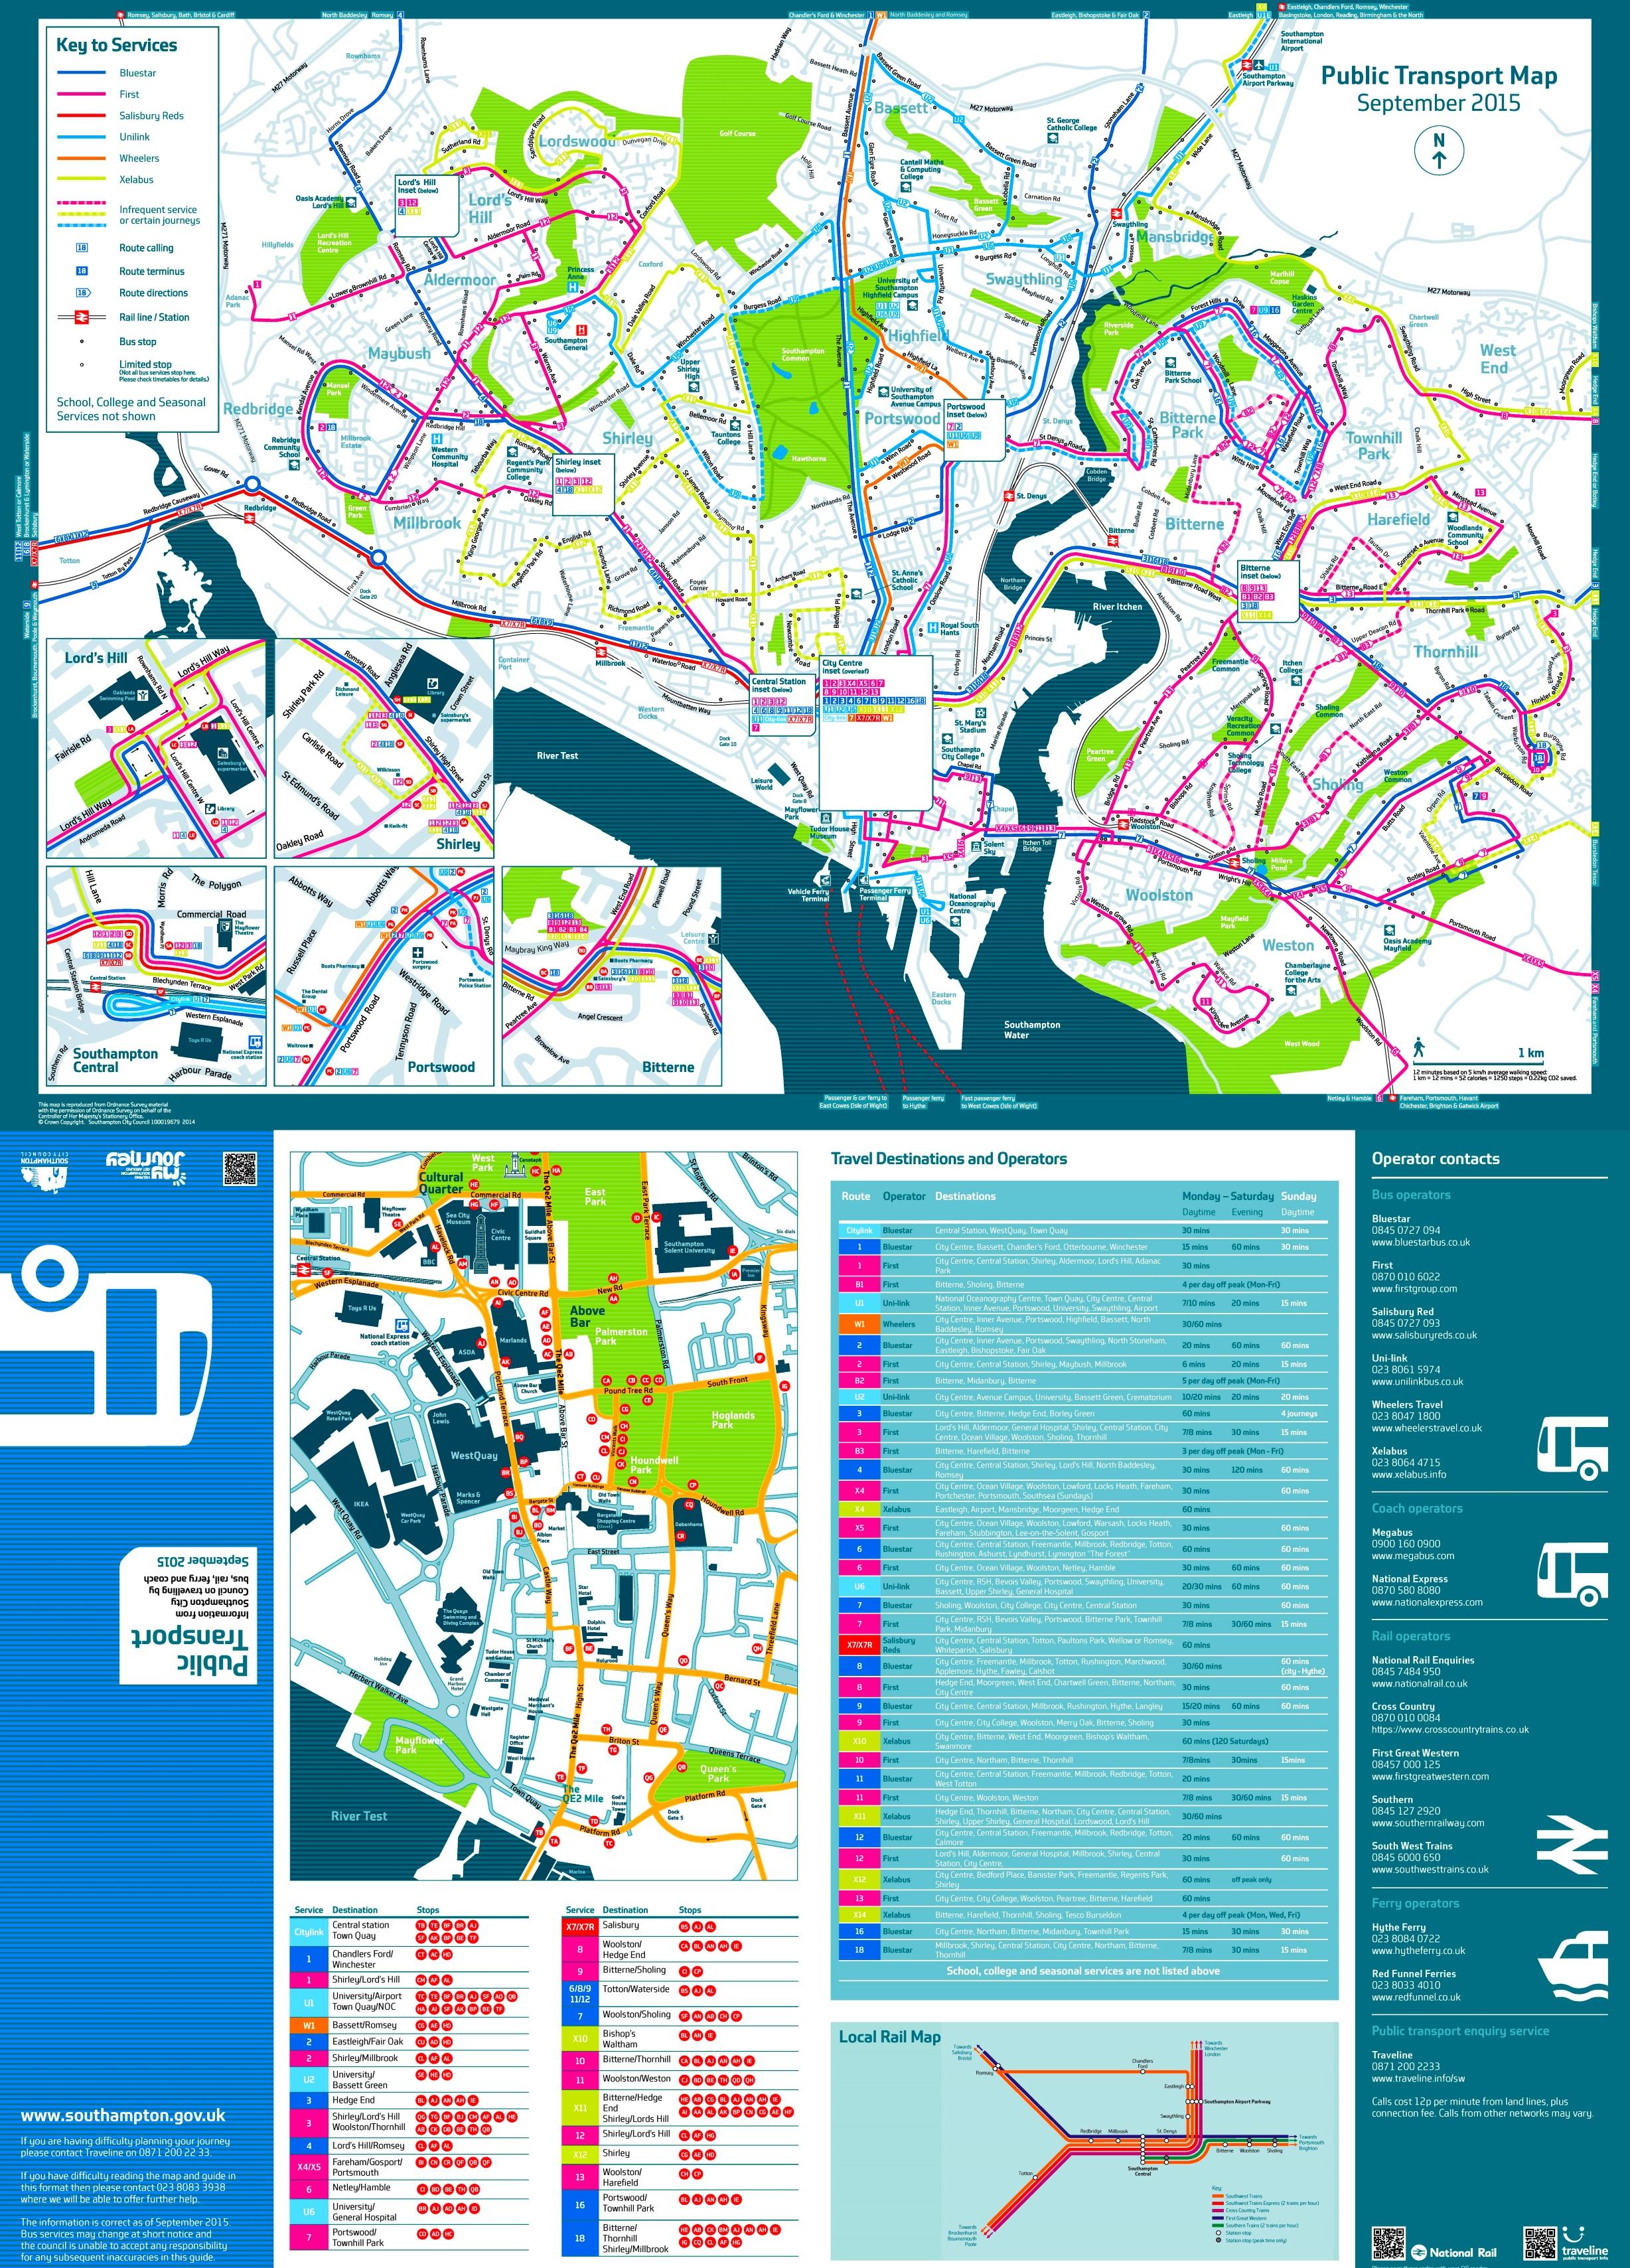 Southampton transport map